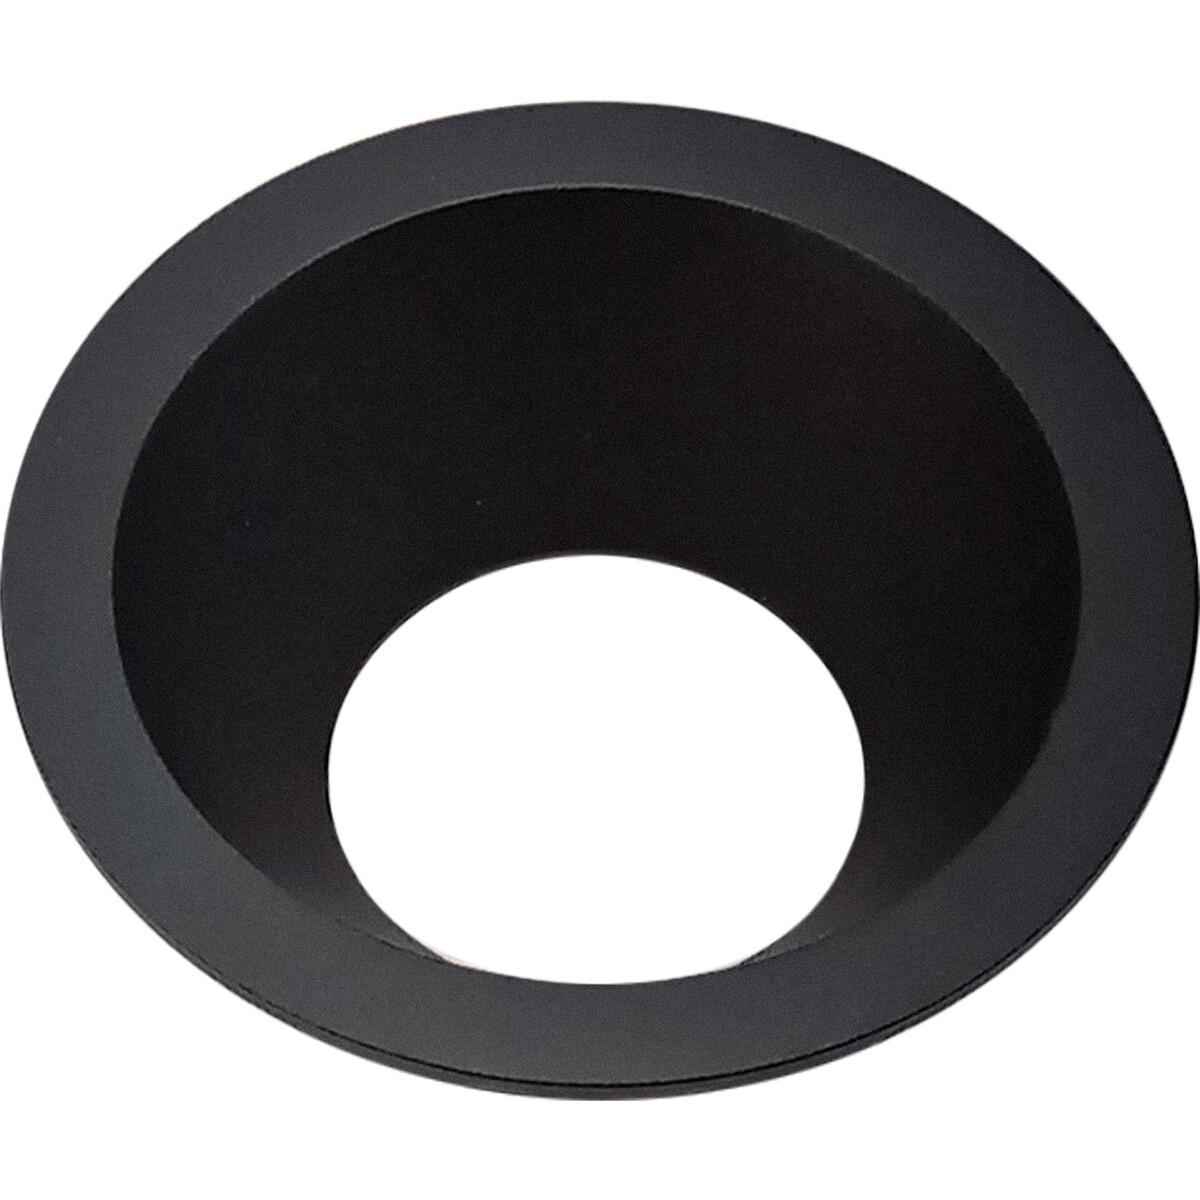 Spot Ring - Pragmi Cliron Pro - Rond - Mat Zwart